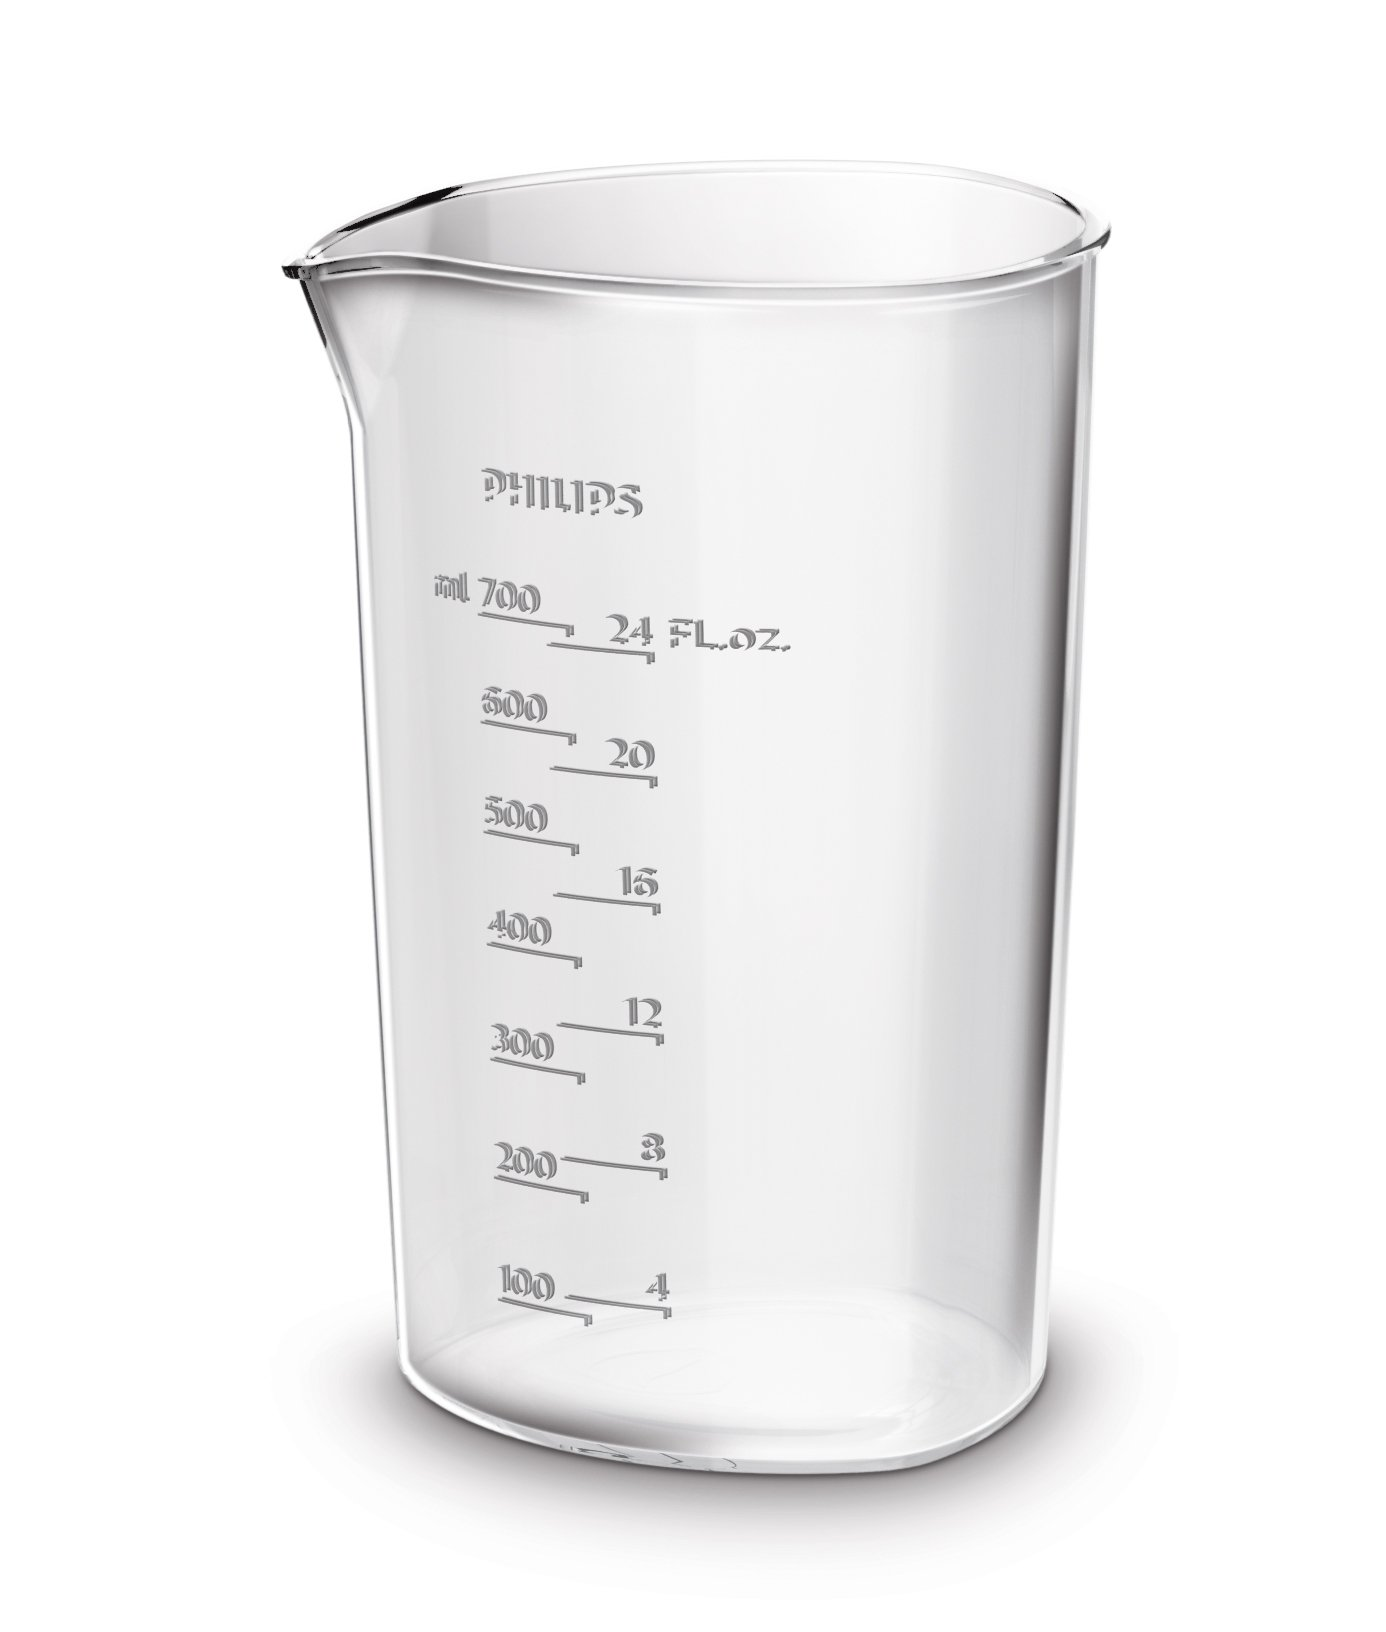 Philips-HR167490-Speed-Touch-2-in-1-Stabmixer-800-Watt-schwarzrot